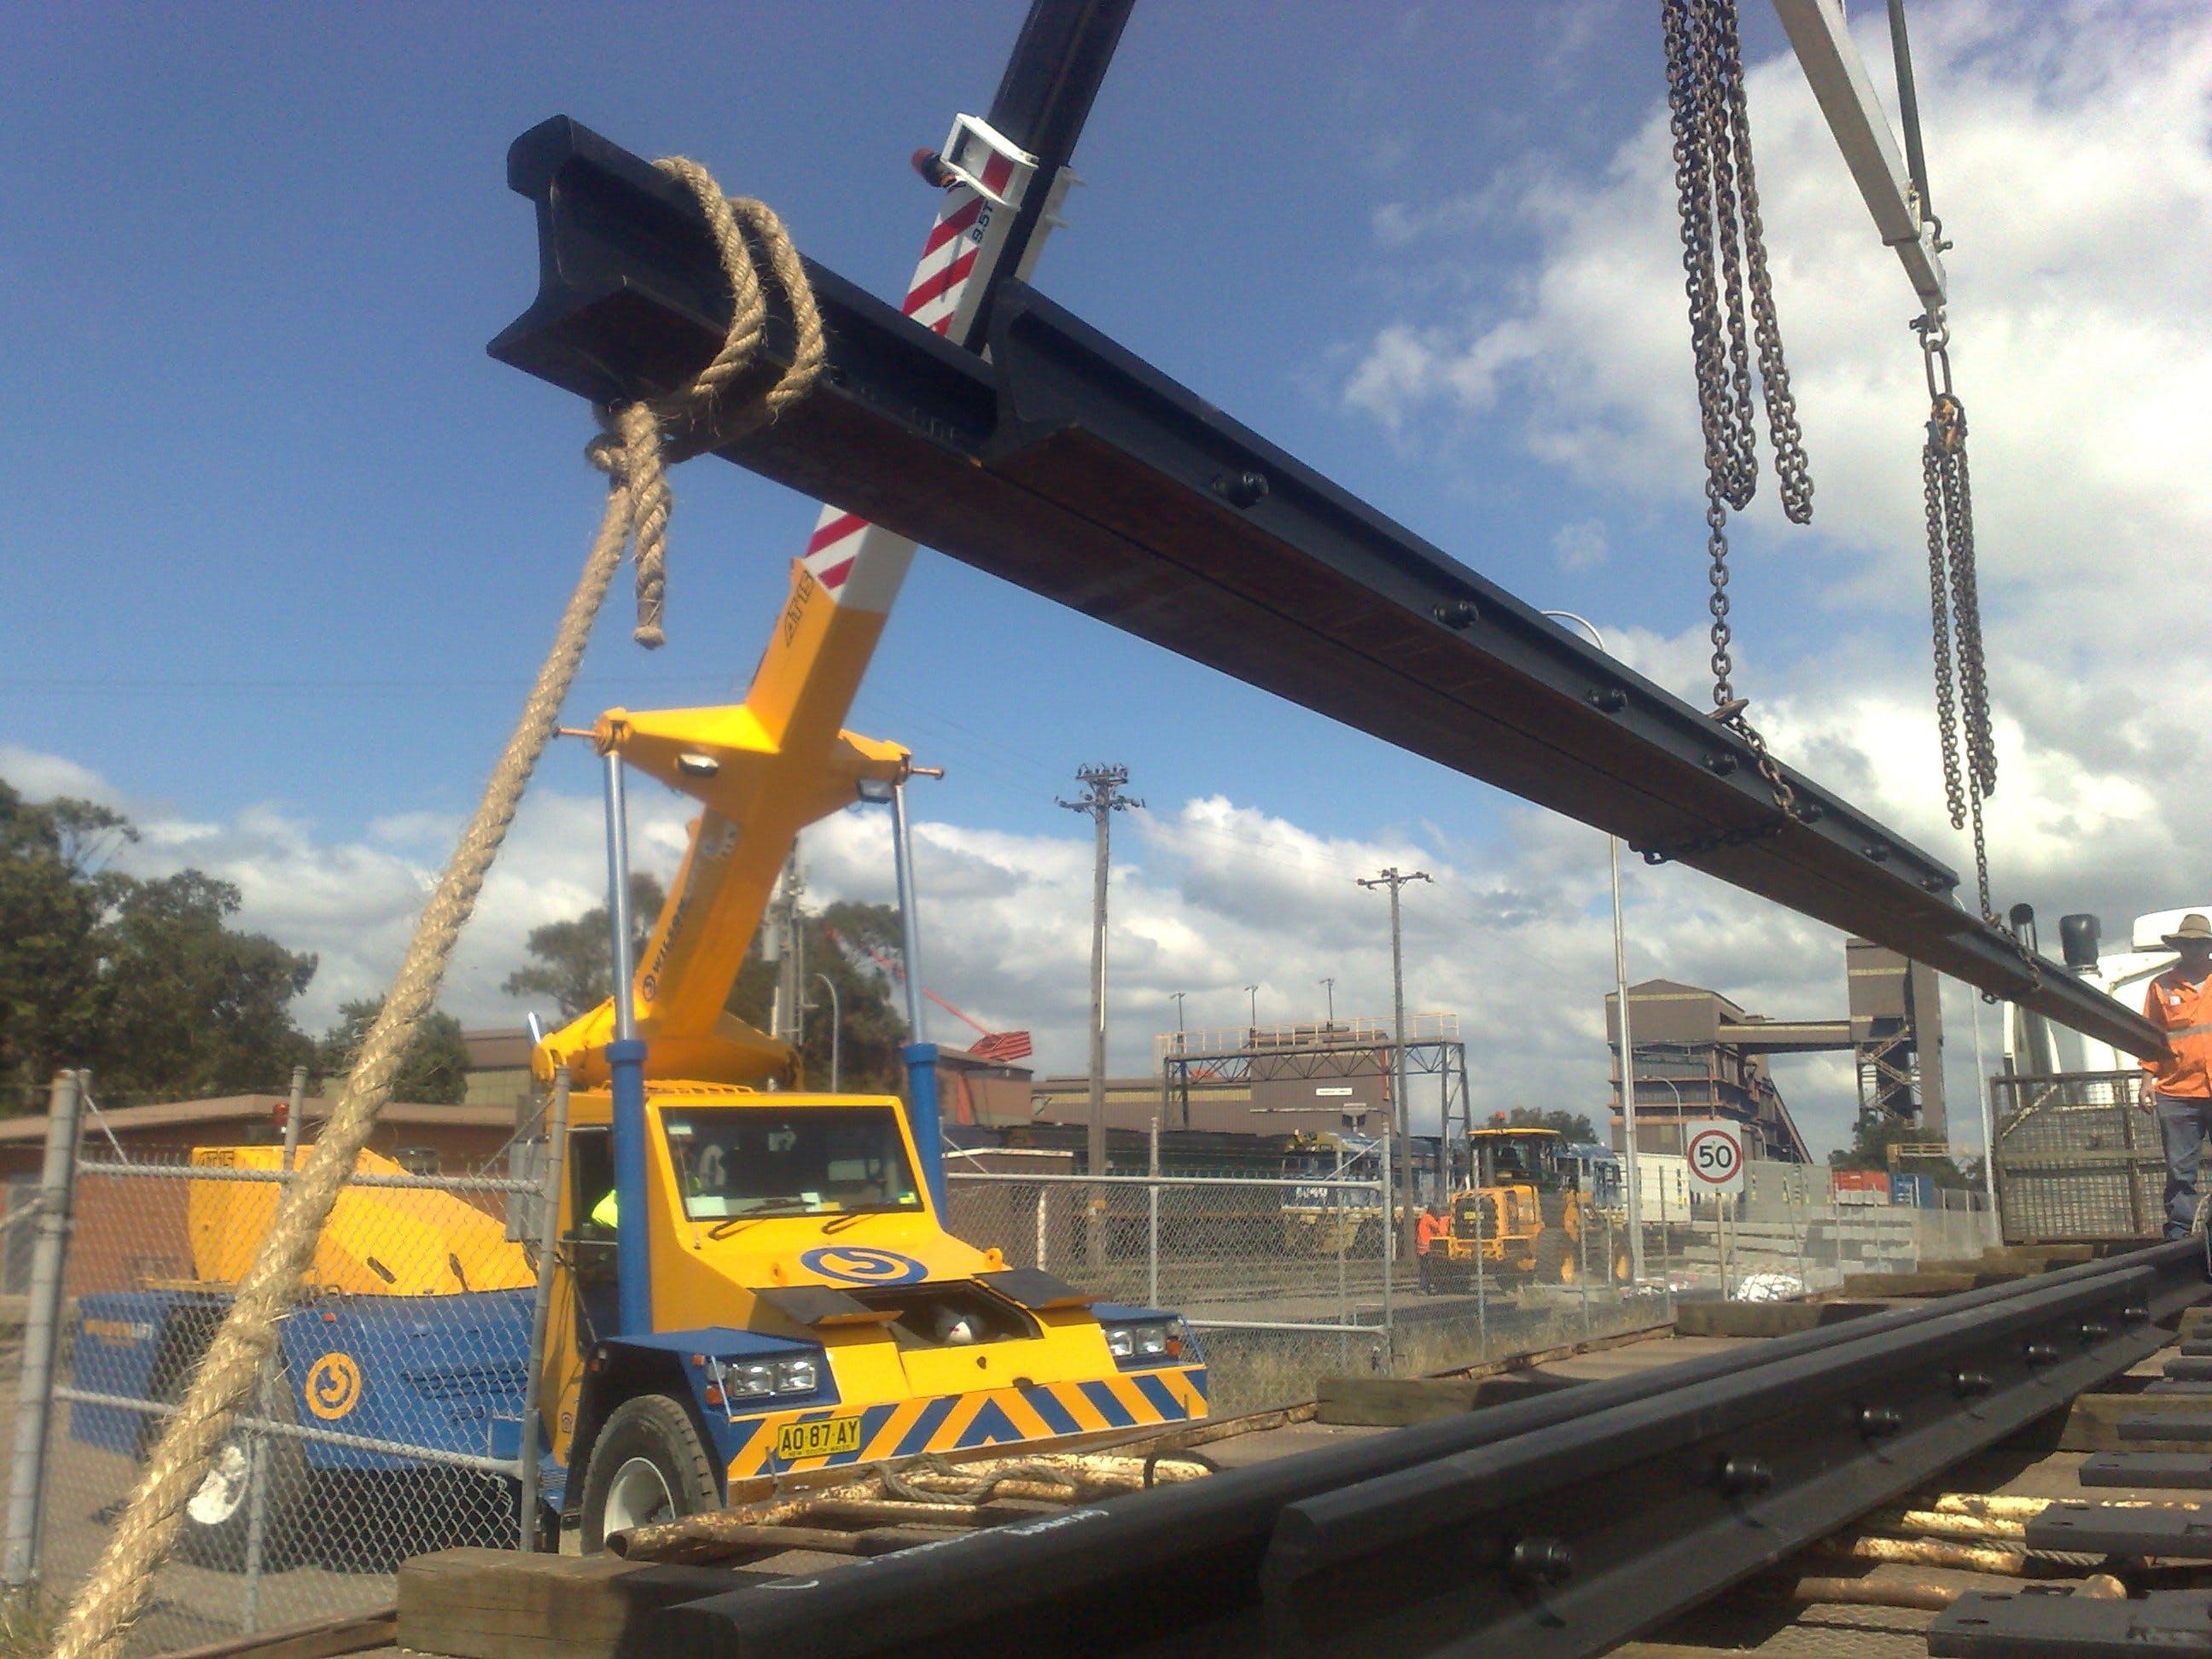 Wilson Lift Cranes